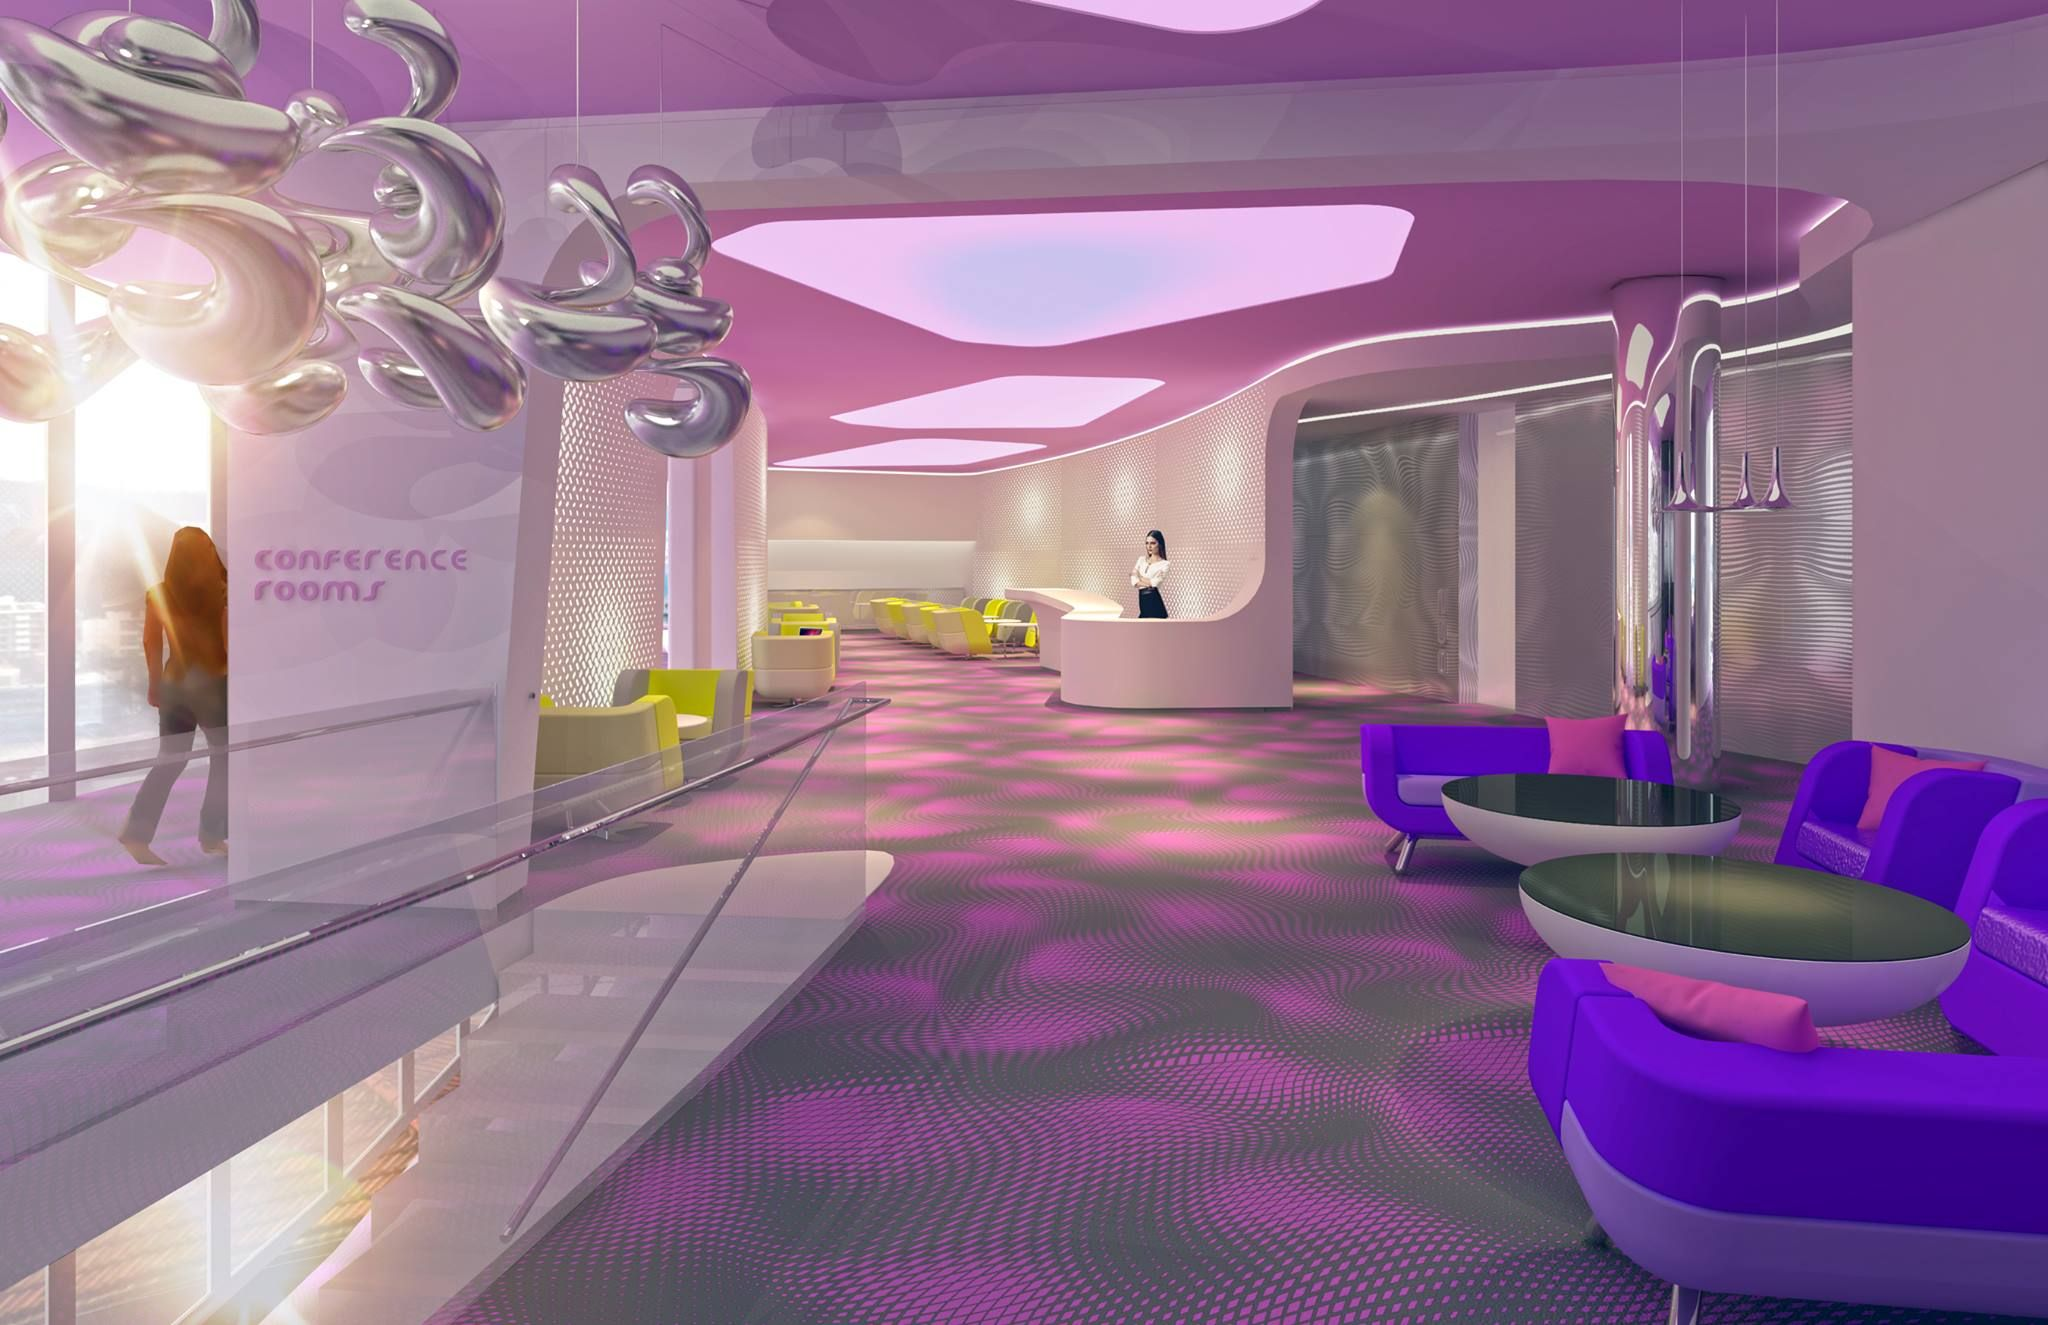 Ven hotel in amsterdam tbc 2017 by karim rashid karim for Hotel barbie